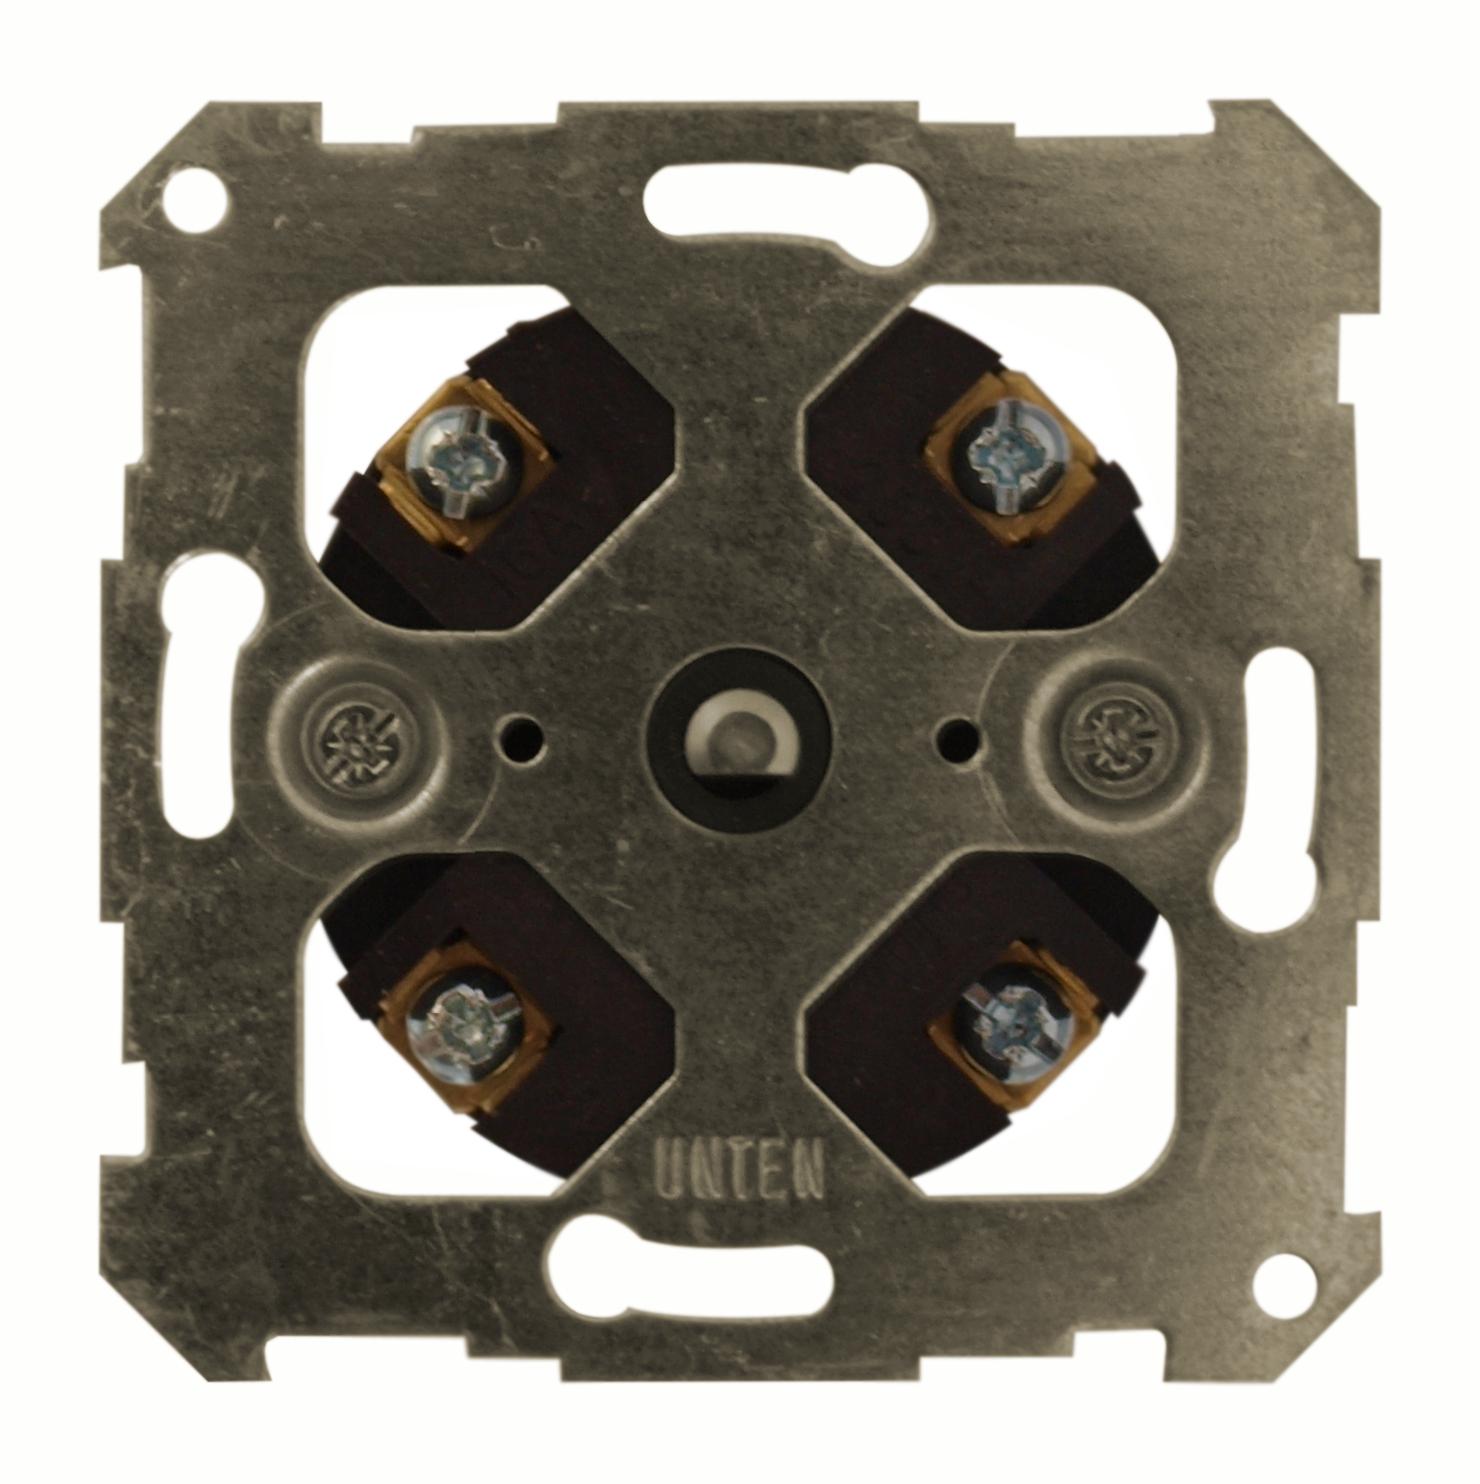 1 Stk UP-Zeitschalter mechanisch, 2-polig, 15 min EL177030--